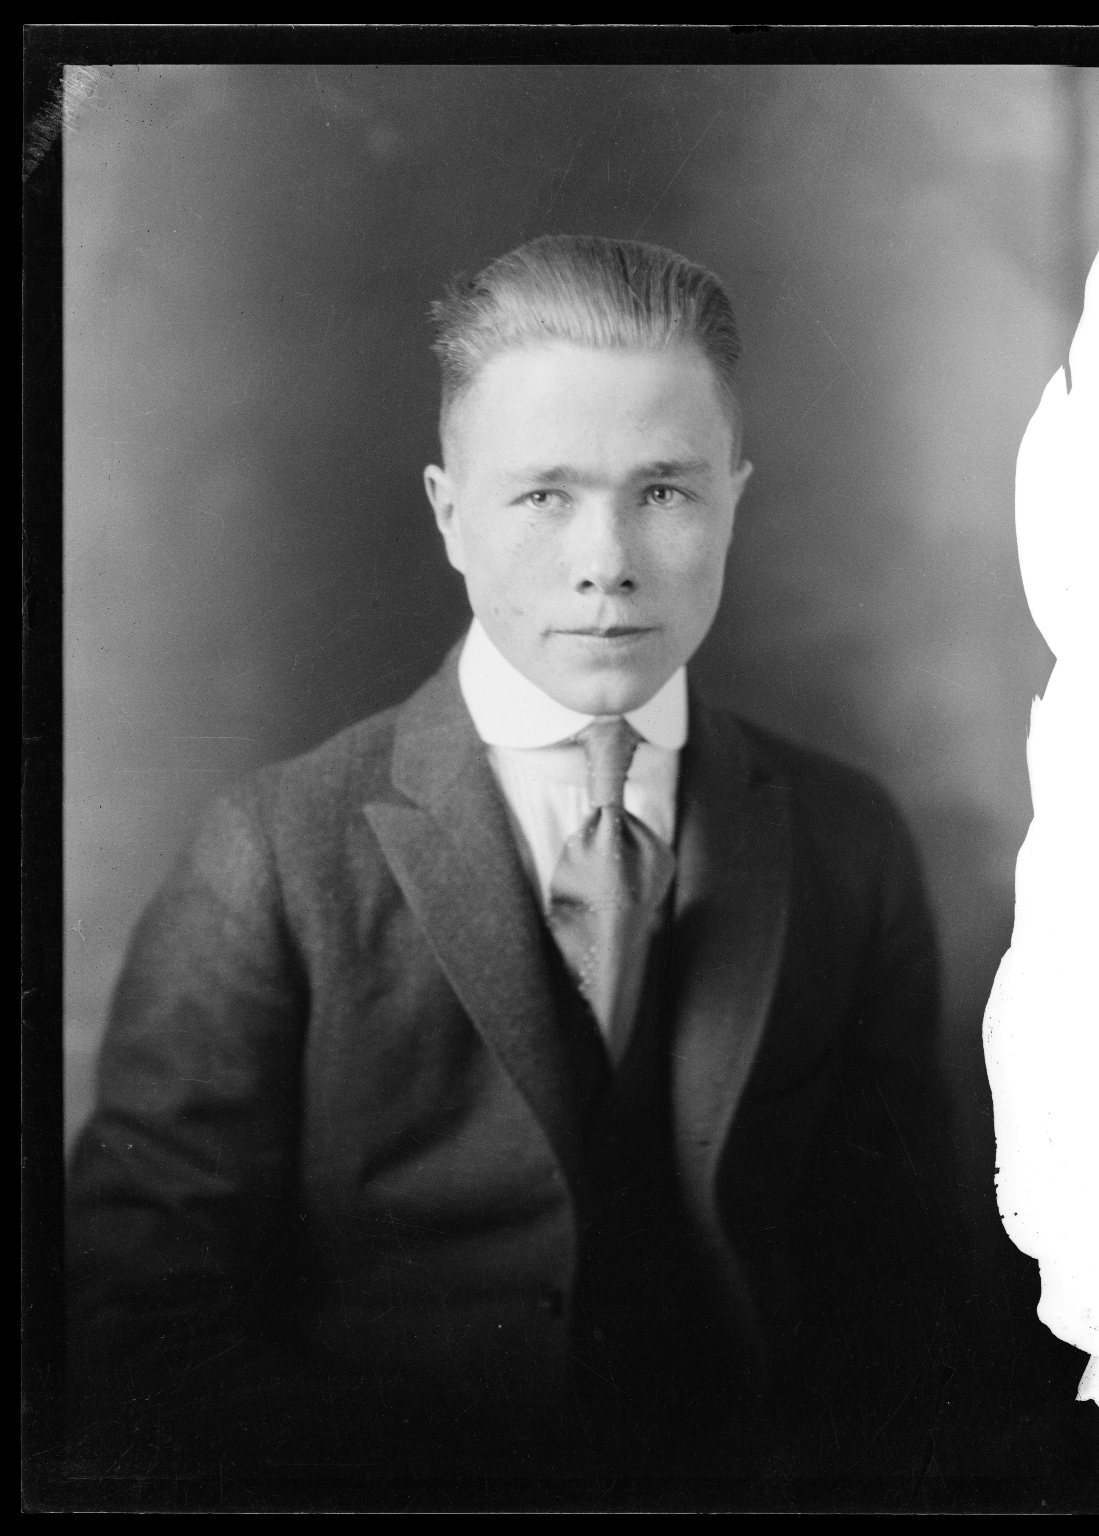 Portraits of William Kneale